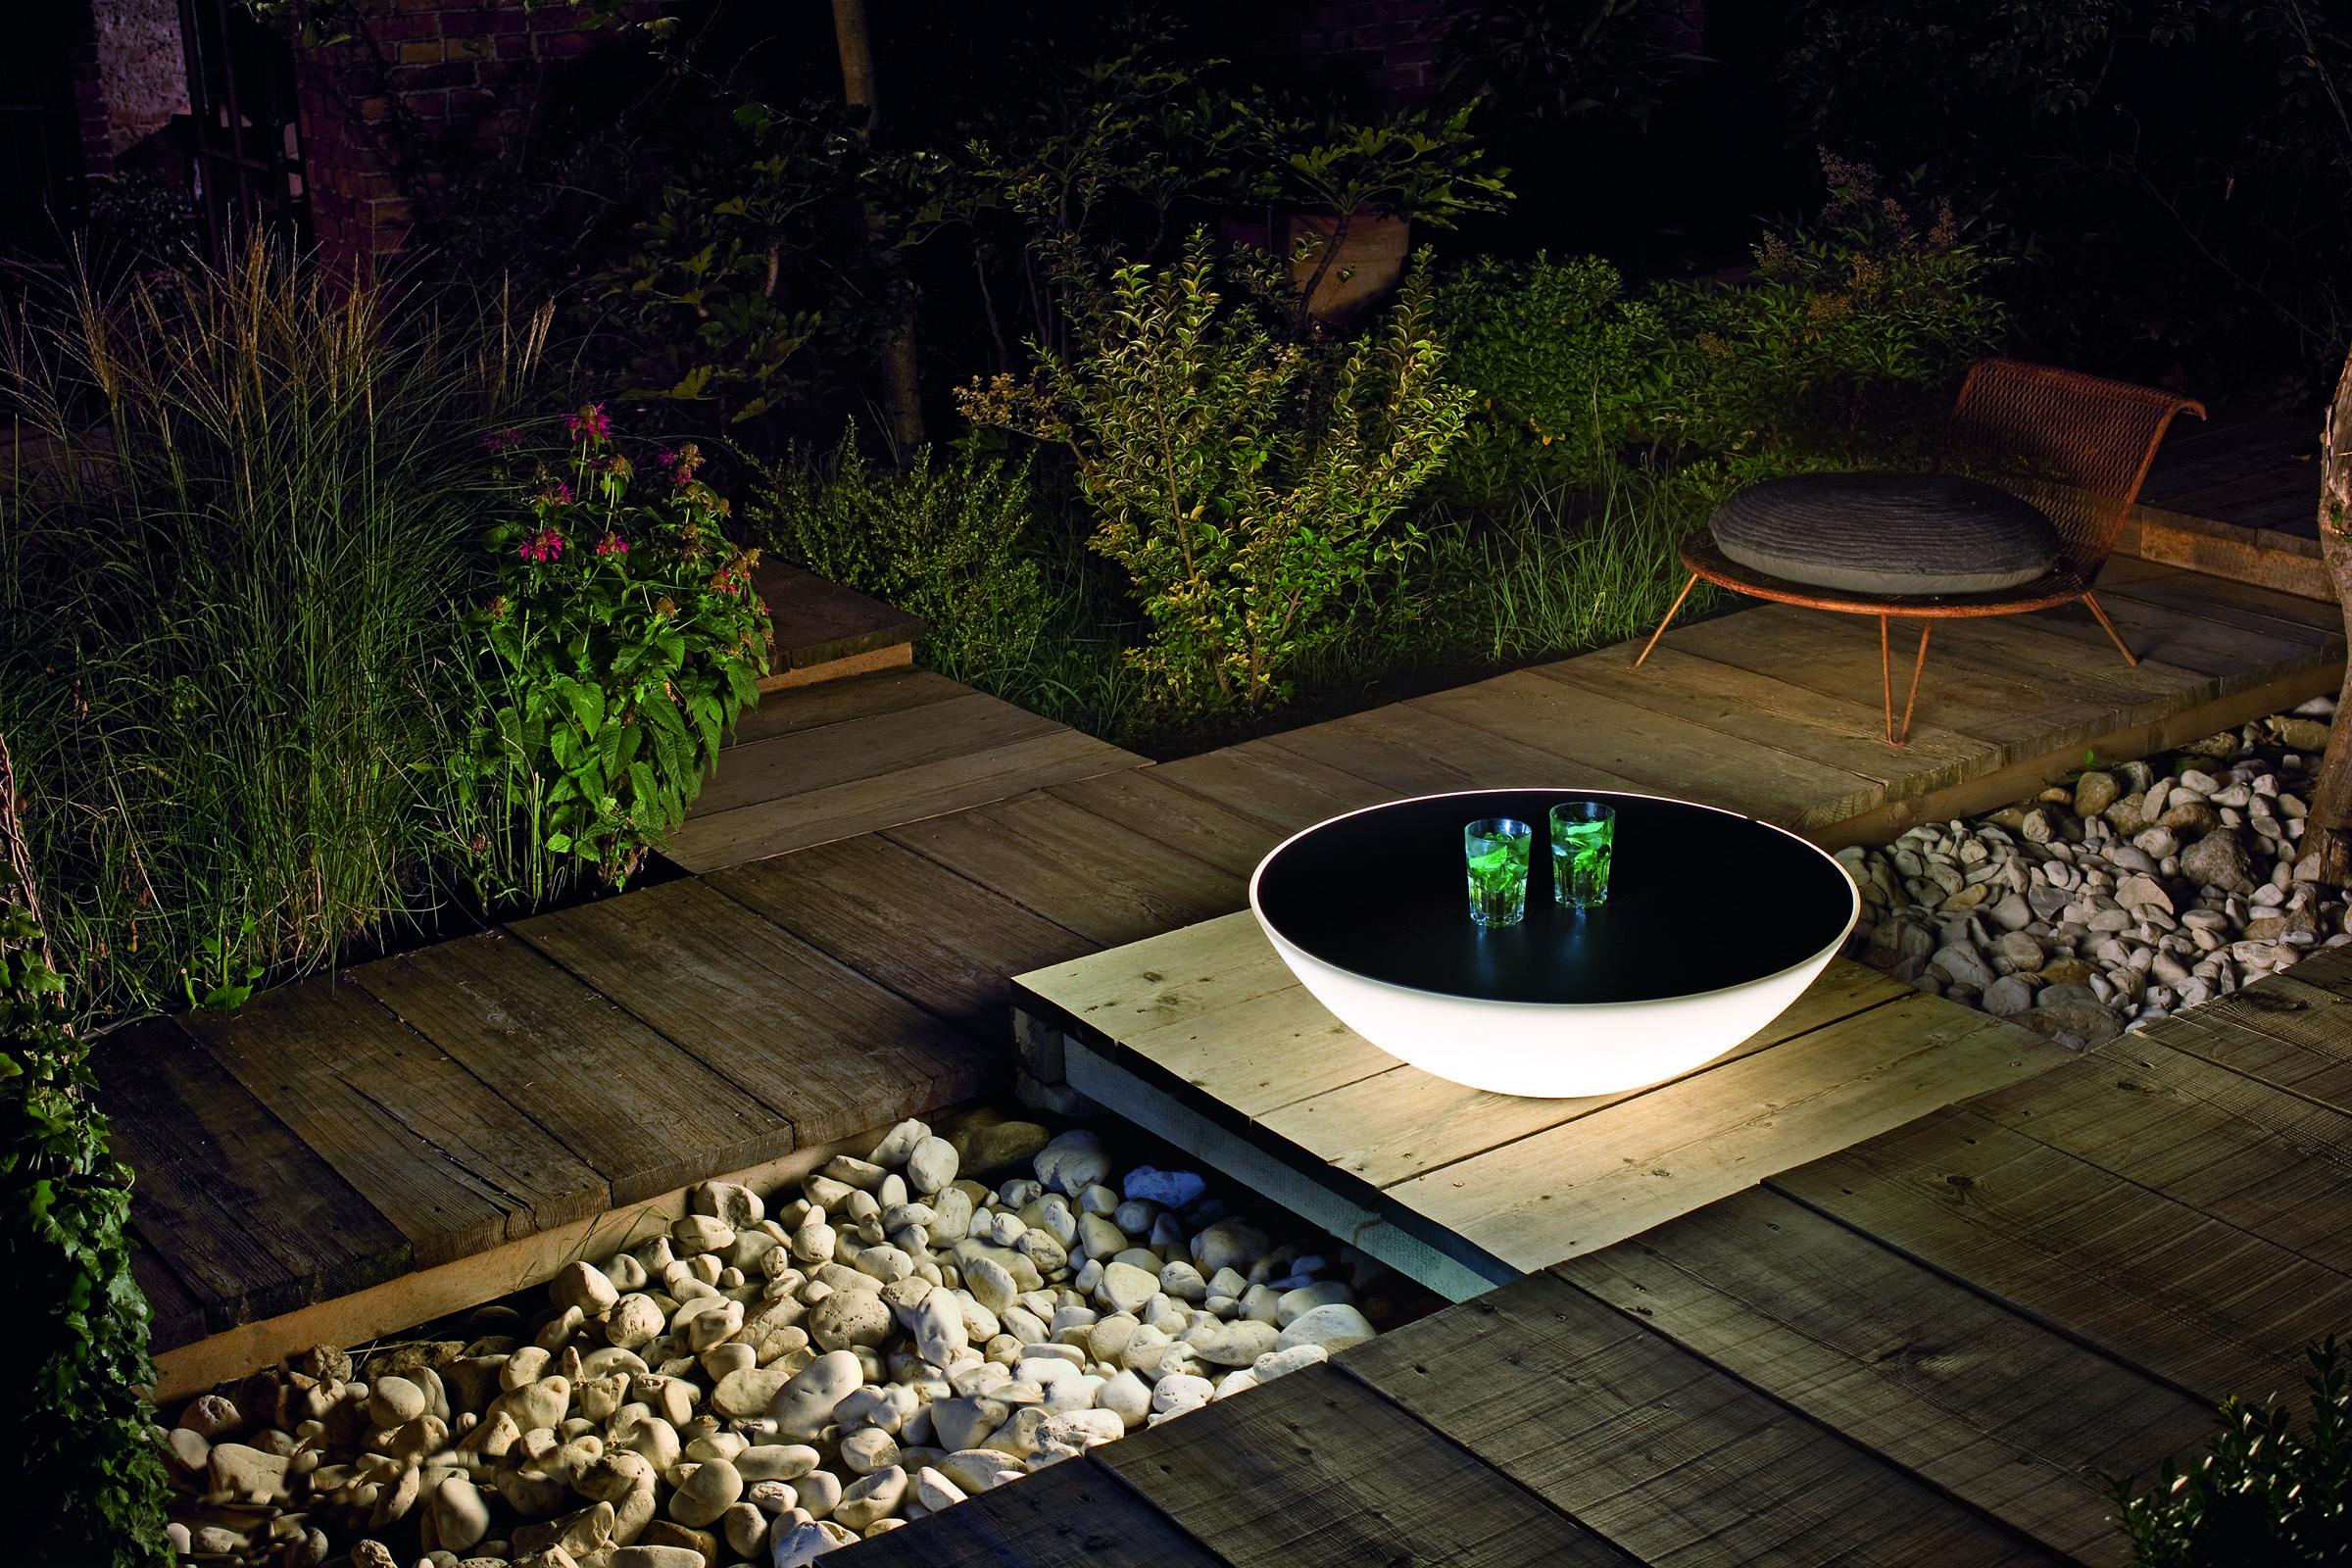 Table Lumineuse Solar De Foscarini | Plancha Exterieur ... concernant Salon De Jardin Lumineux